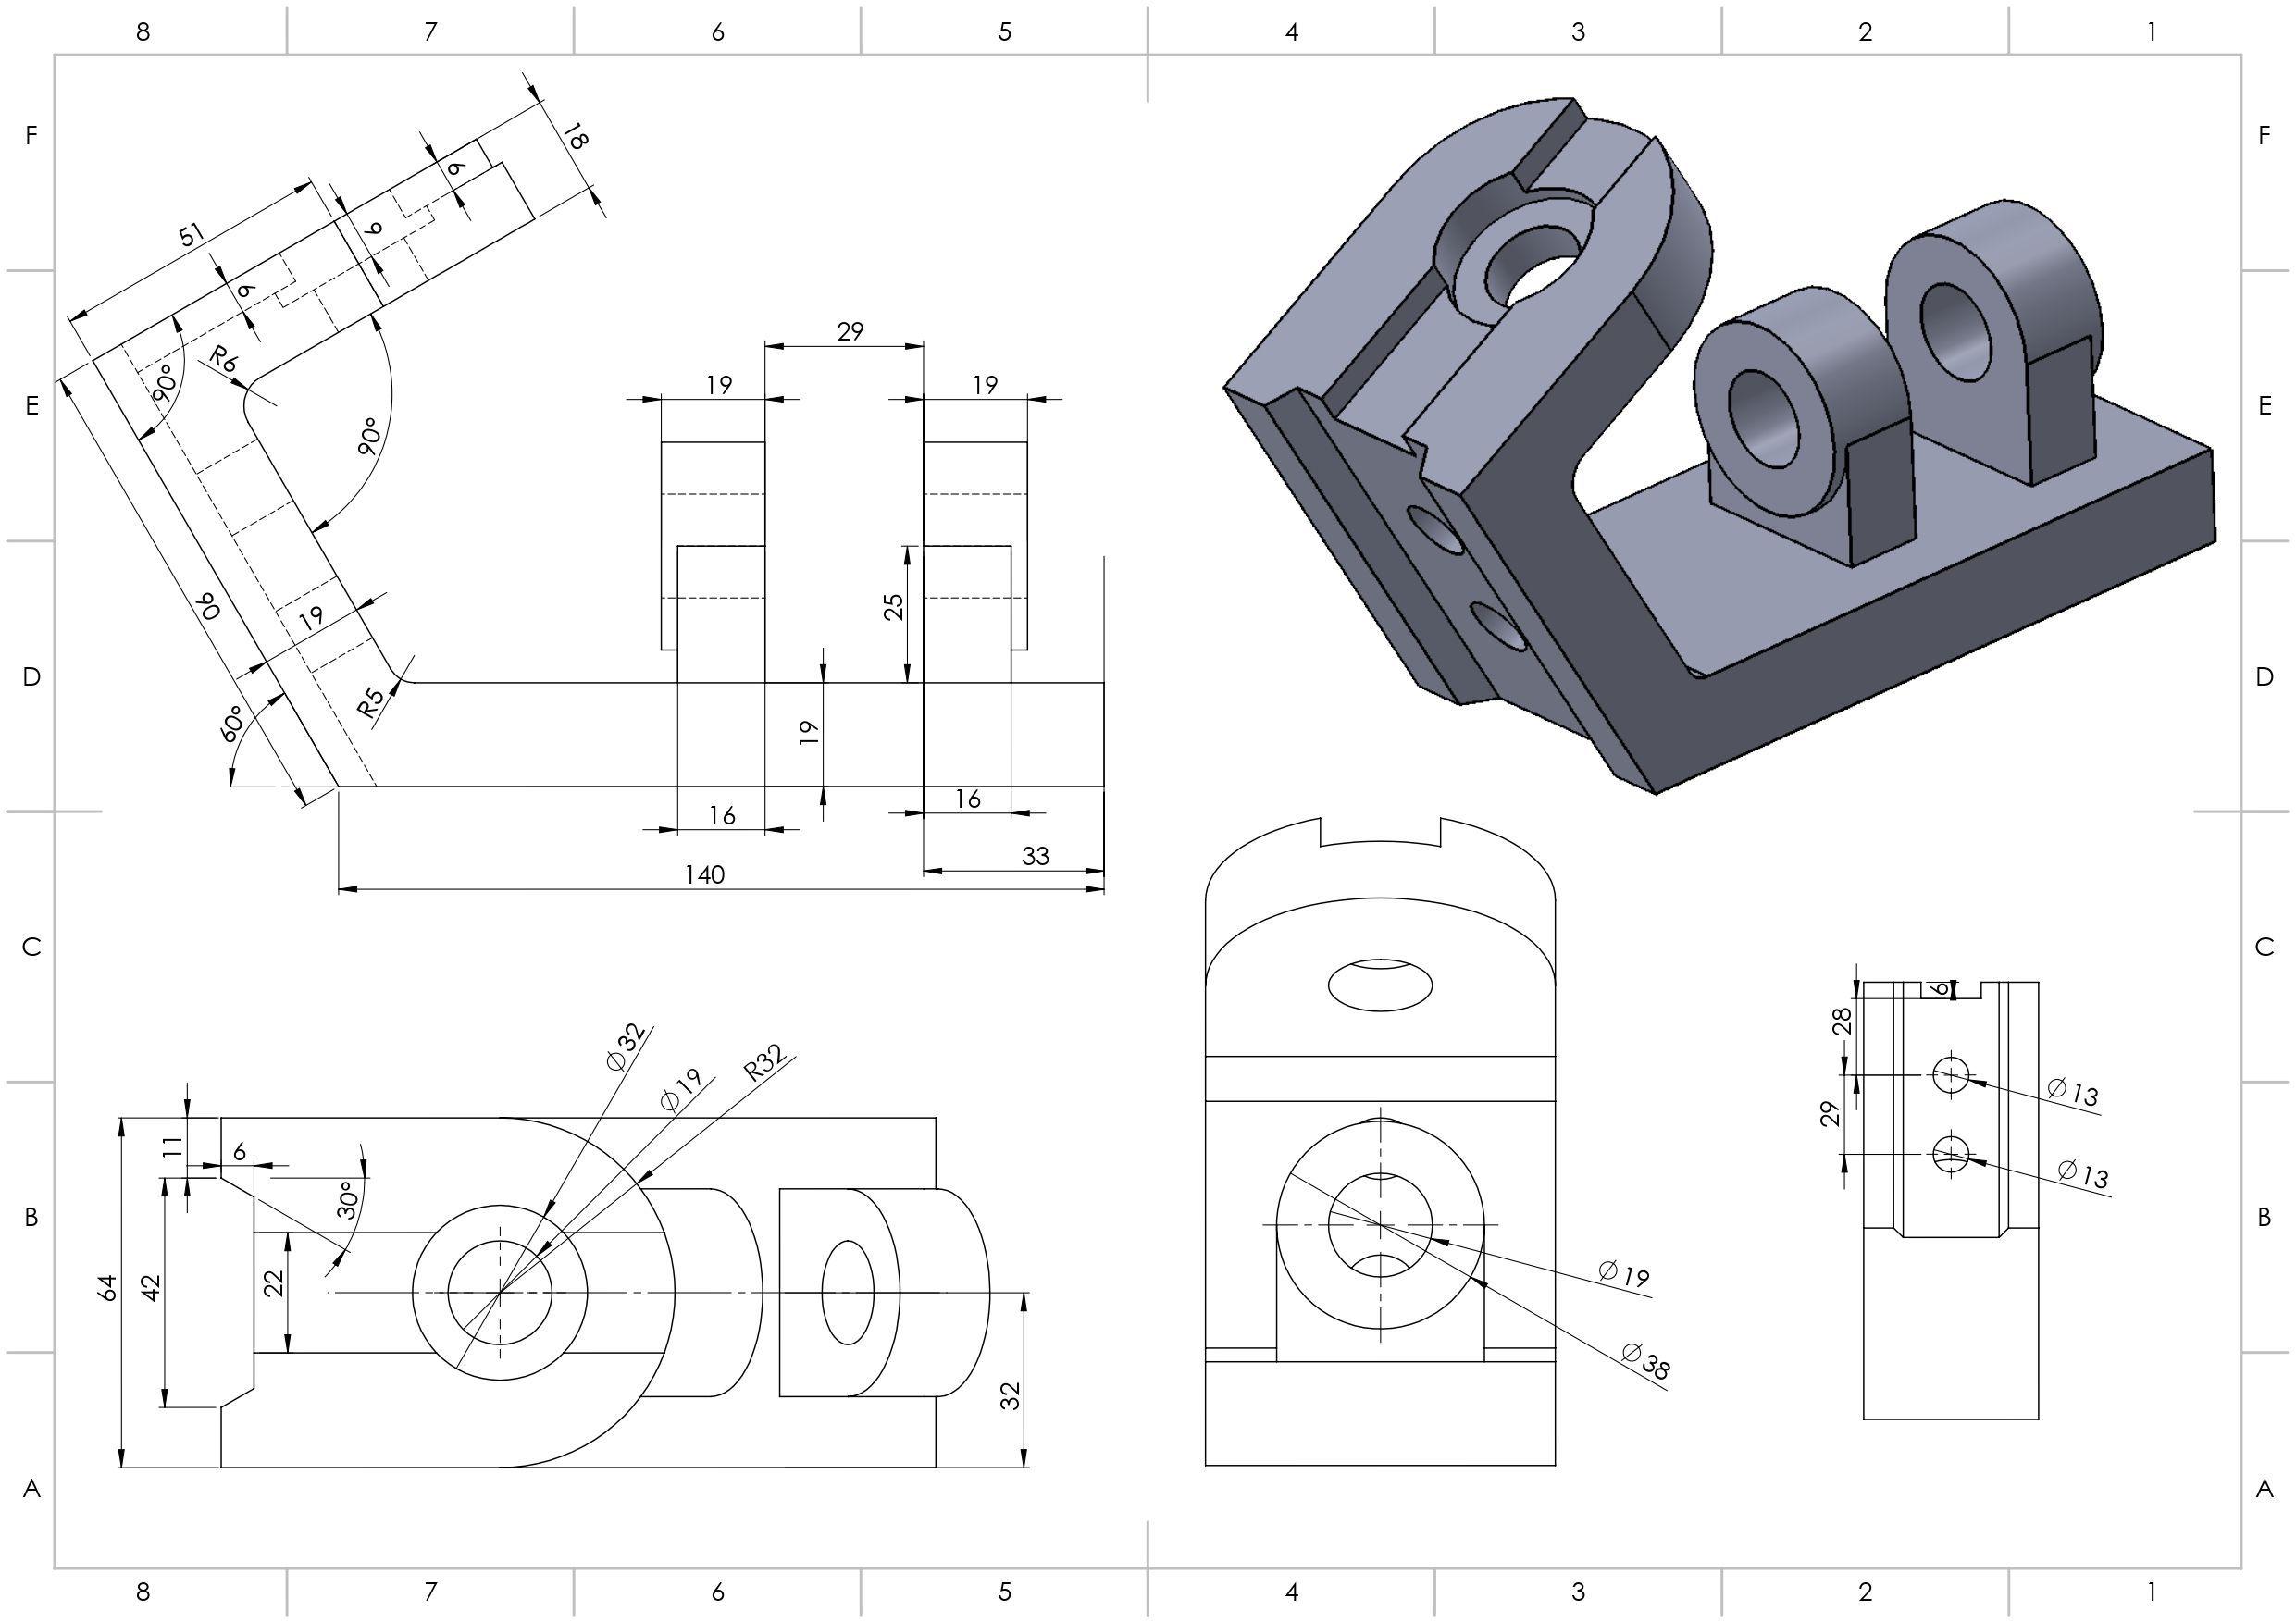 Ejercicio 10 Planos Mecanicos Ejercicios De Dibujo Tecnicas De Dibujo